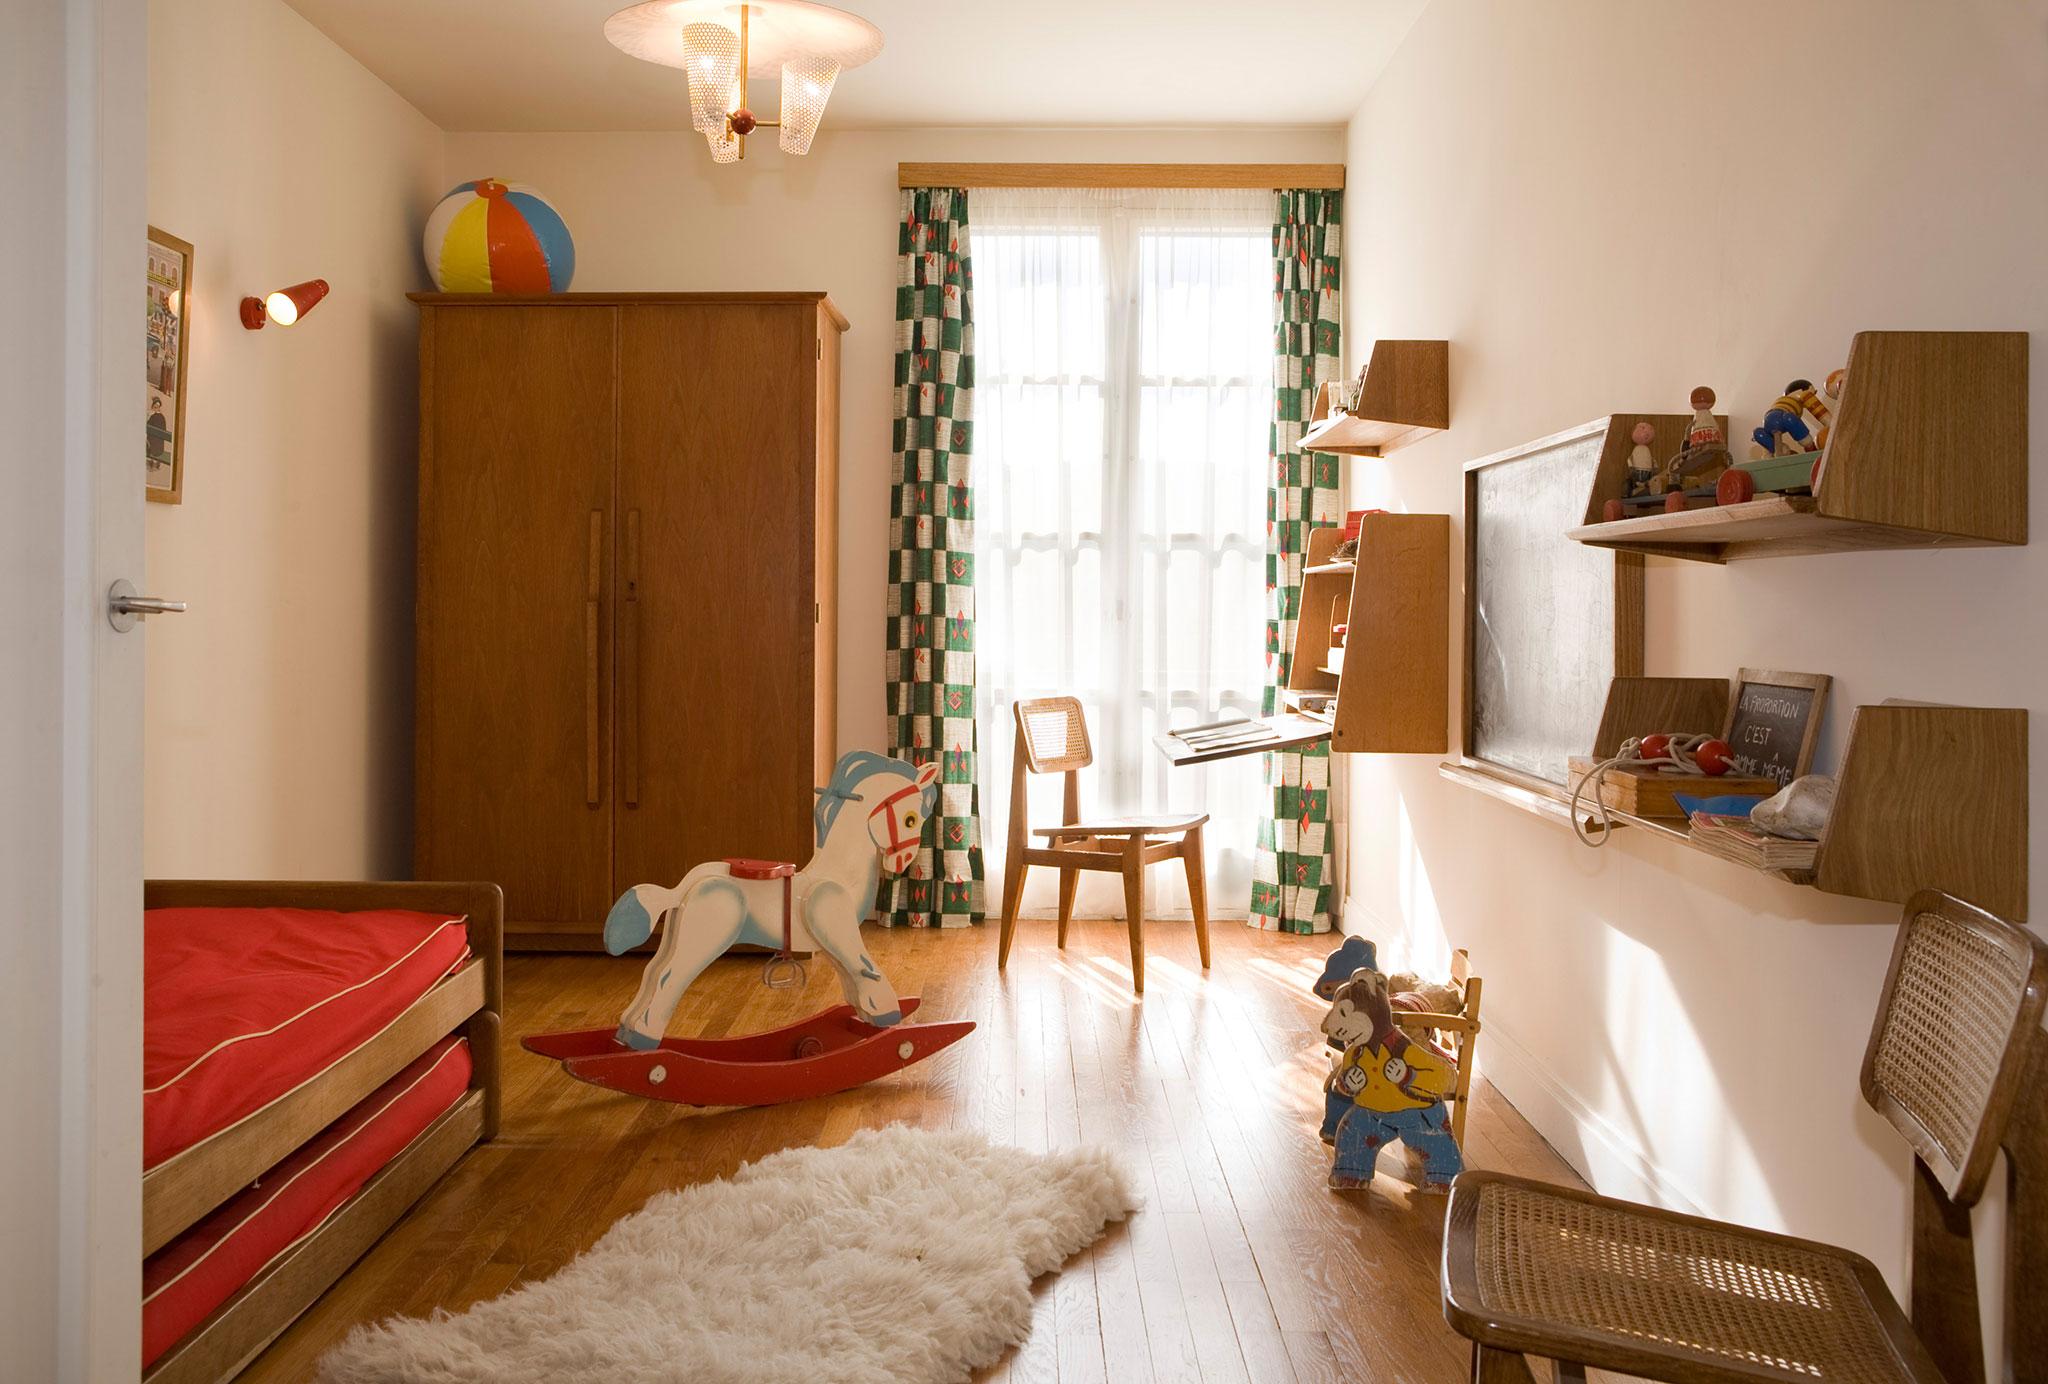 le mobilier et le design le havre. Black Bedroom Furniture Sets. Home Design Ideas